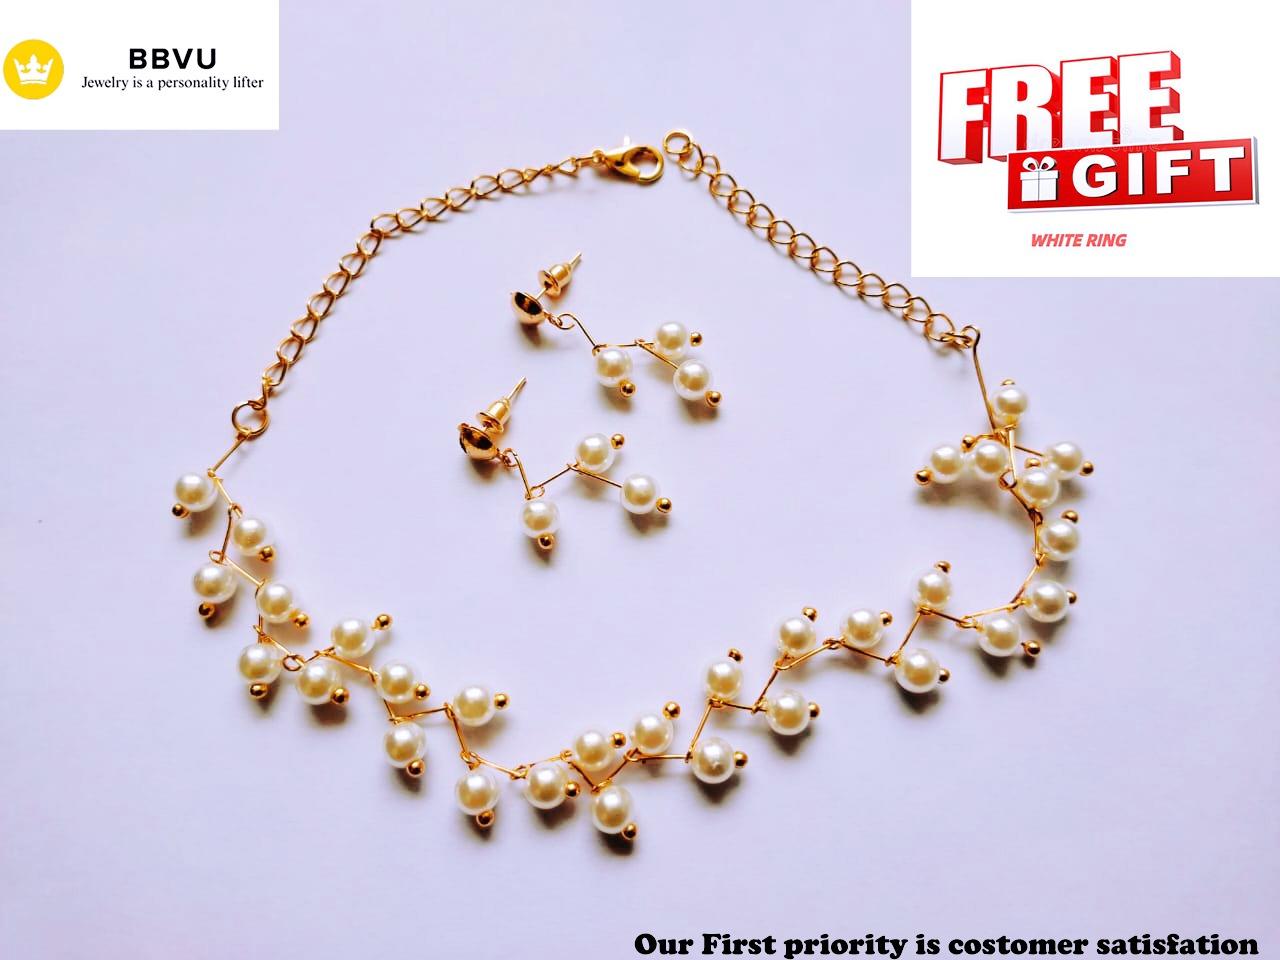 Royal Indian Jewellery Necklace Set Beautiful Earrings for girl/women